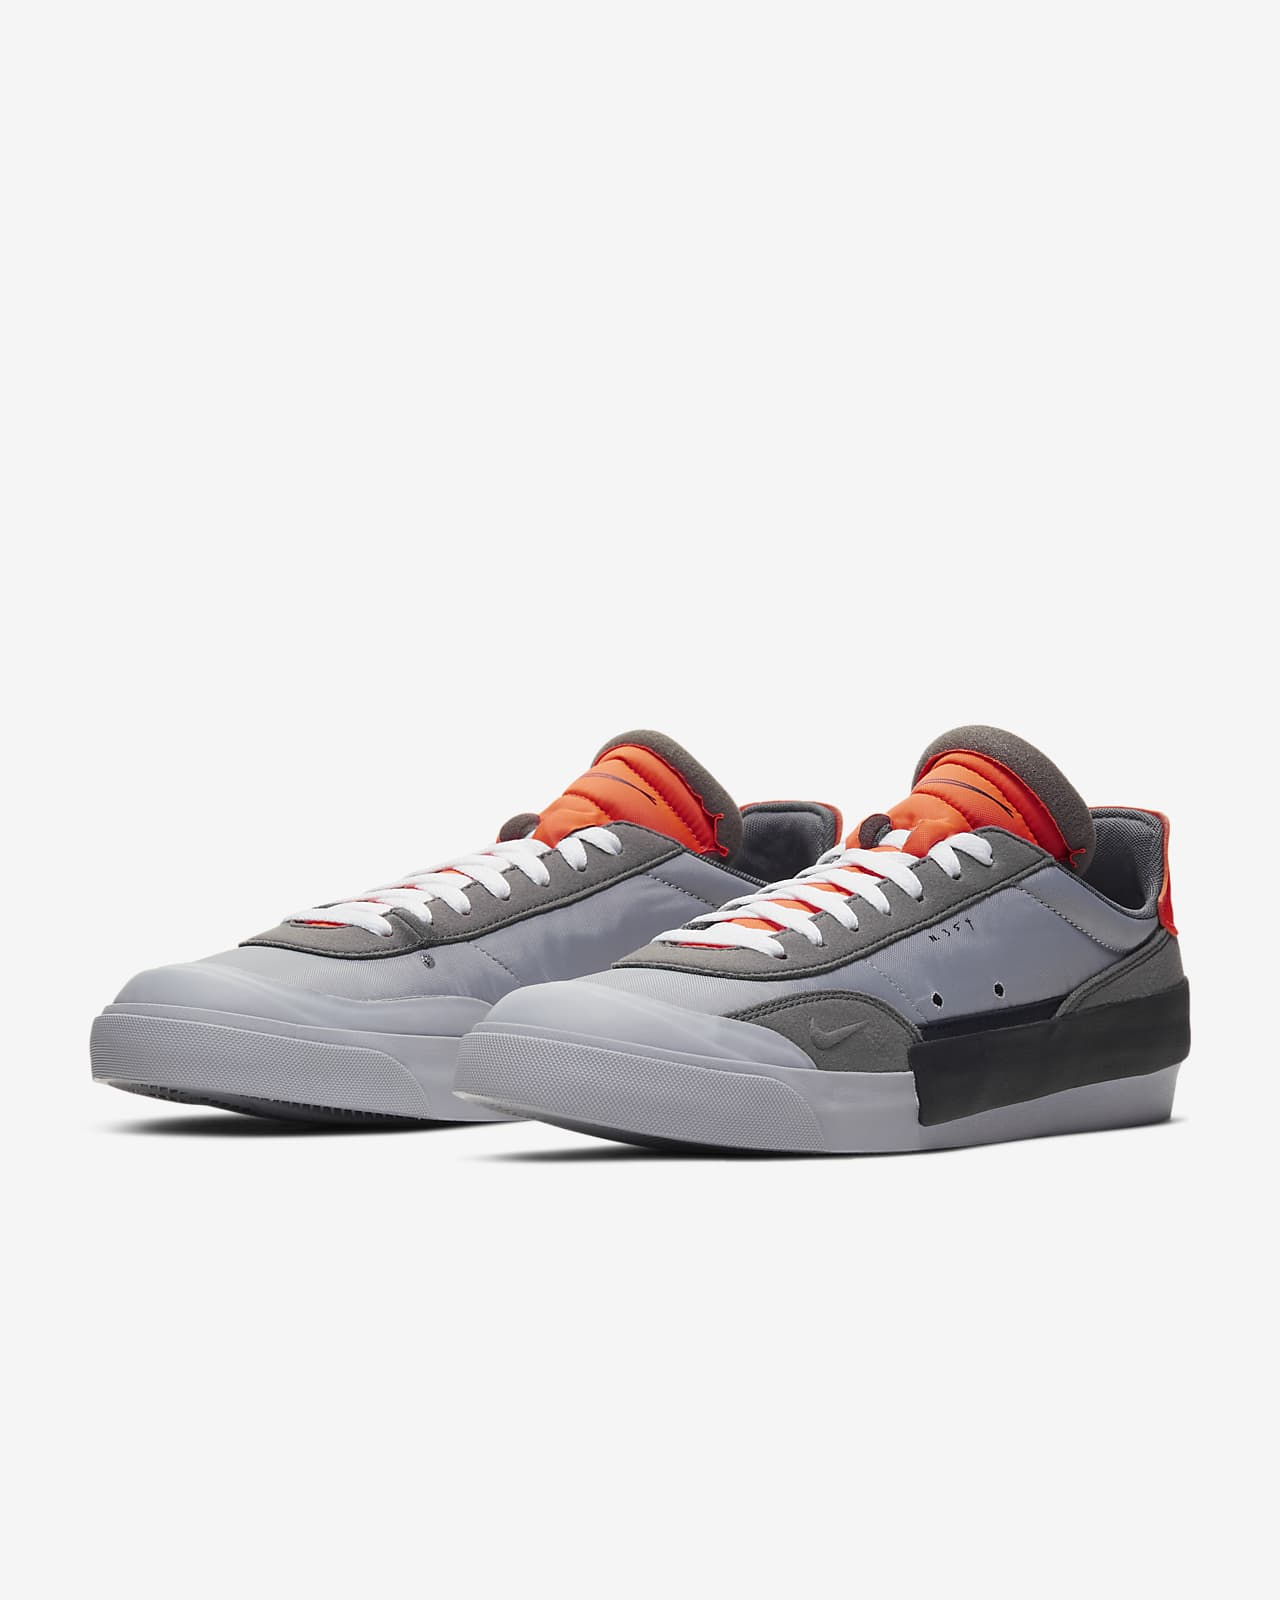 Nike Drop Type LX Men's Shoe. Nike PH